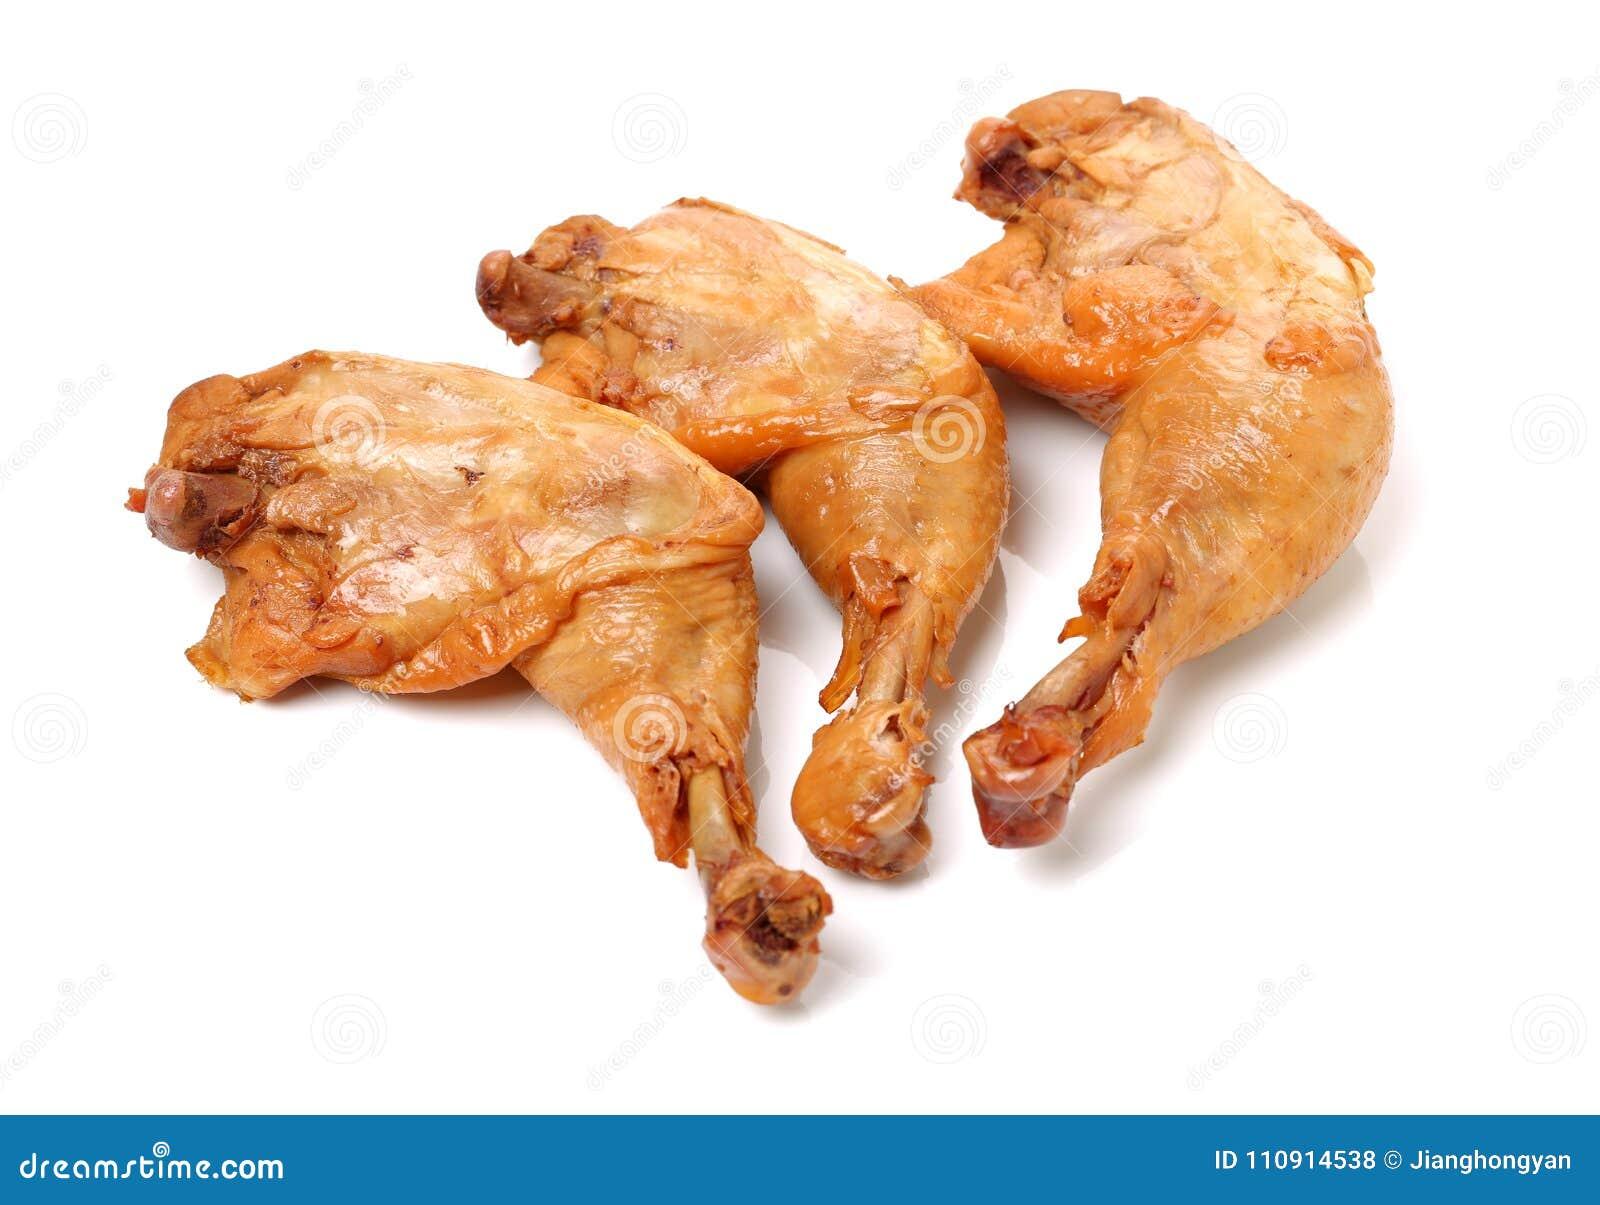 Jambe de poulet rôti